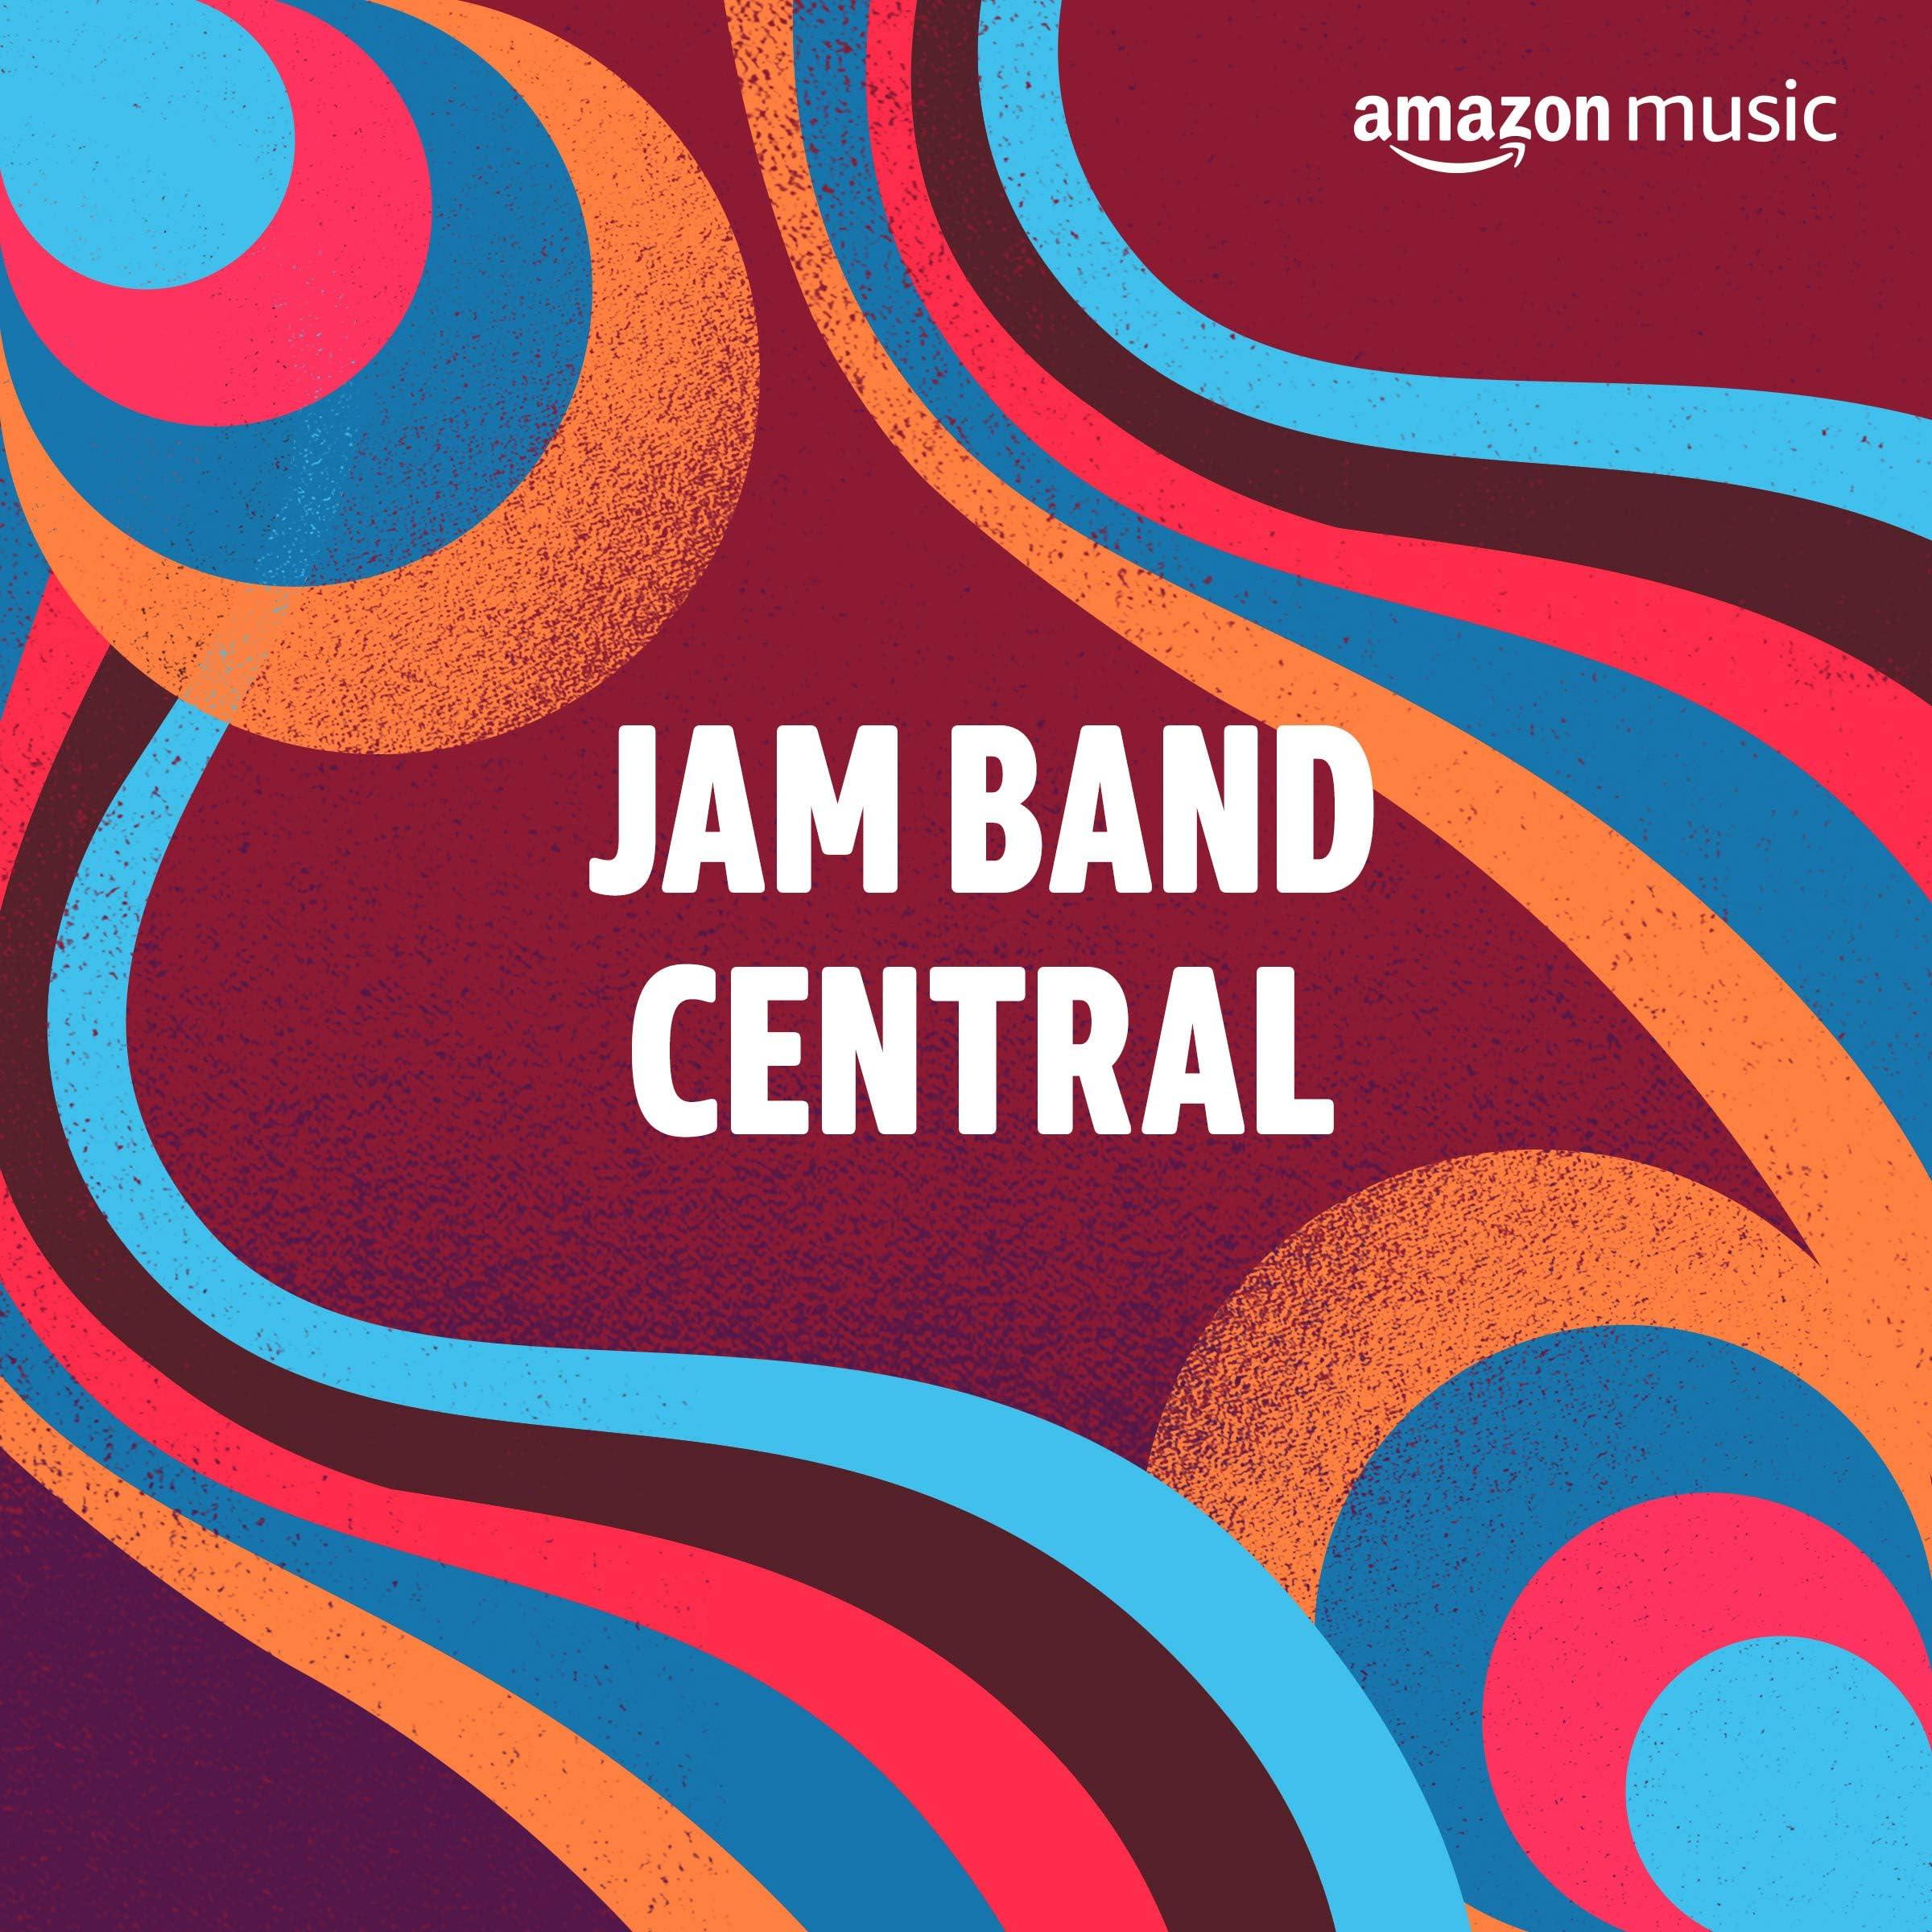 Jam Band Central